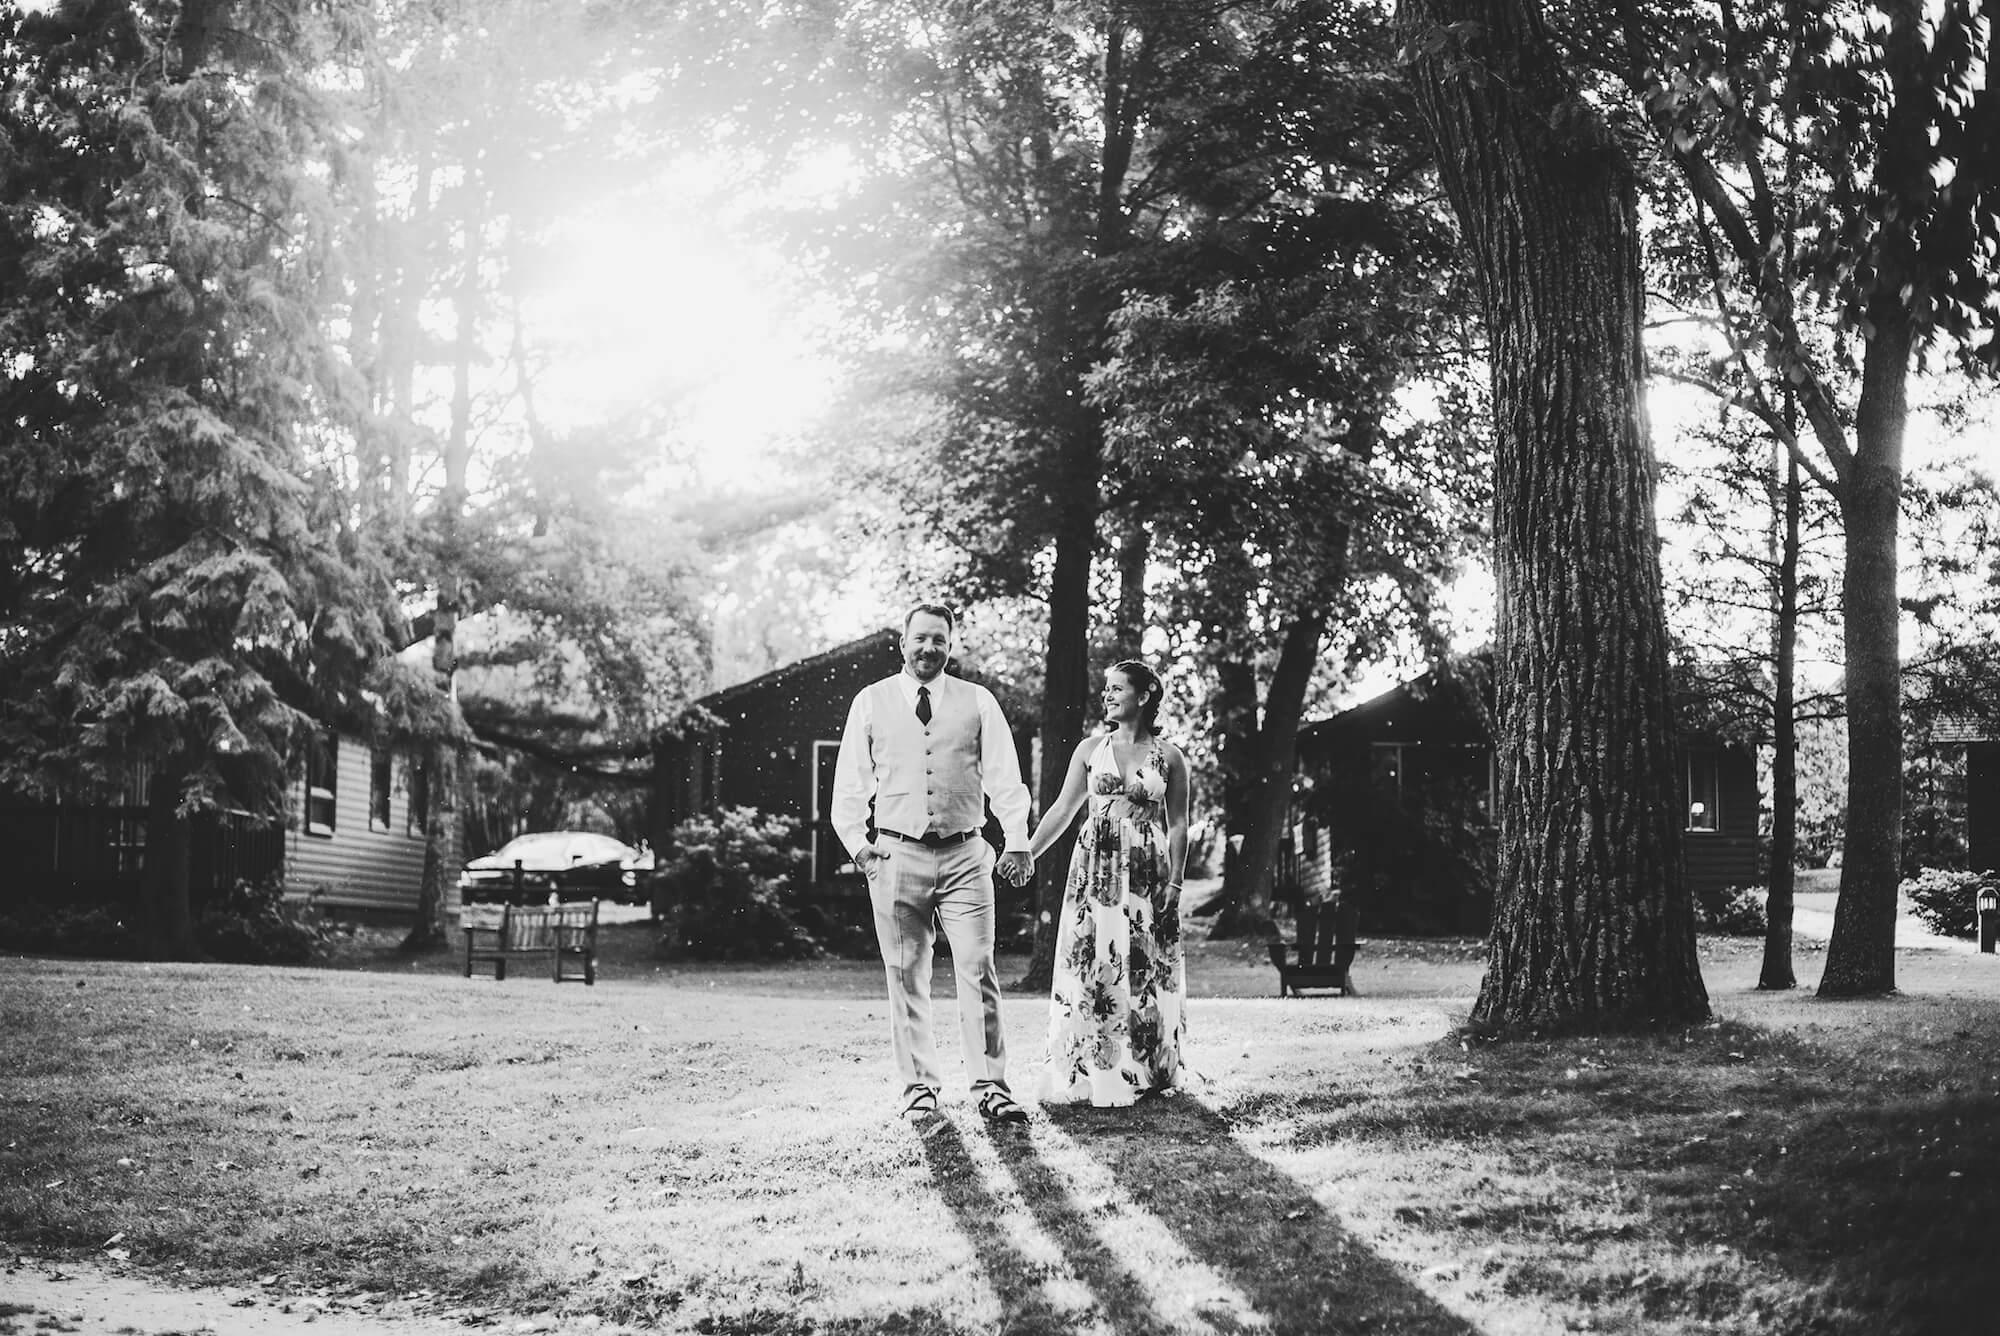 engle-olson-maddy-pat-mn-wedding-photography-40.jpg